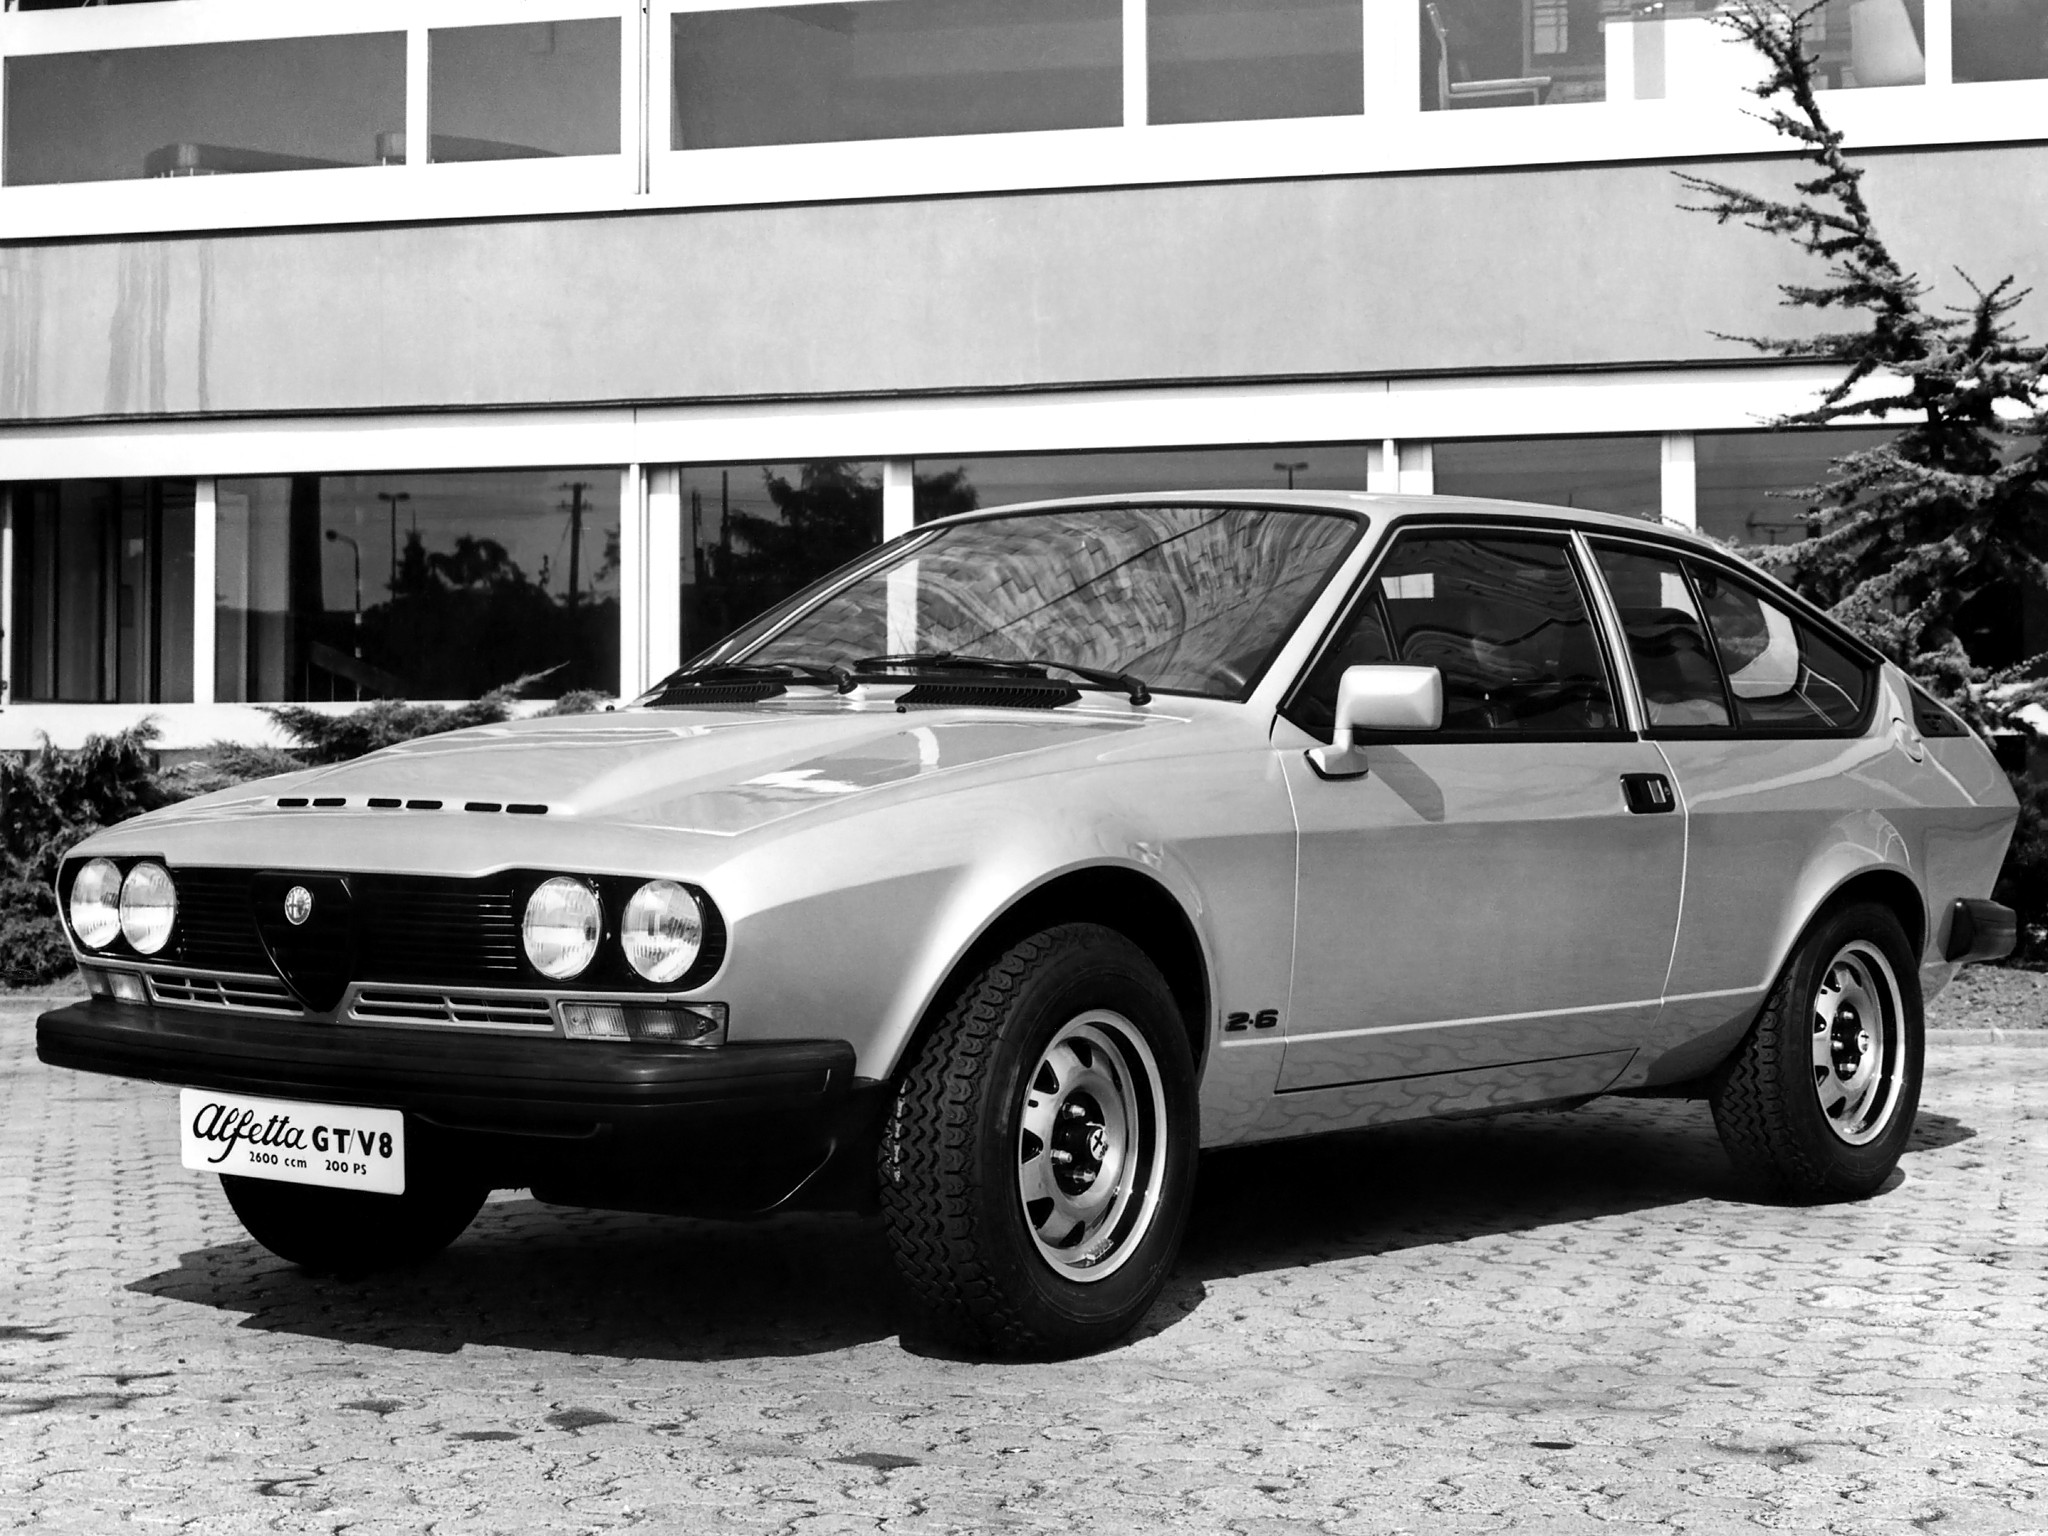 Alfa 4c 2019 >> ALFA ROMEO Alfetta GTV specs & photos - 1976, 1977, 1978, 1979, 1980, 1981, 1982 - autoevolution